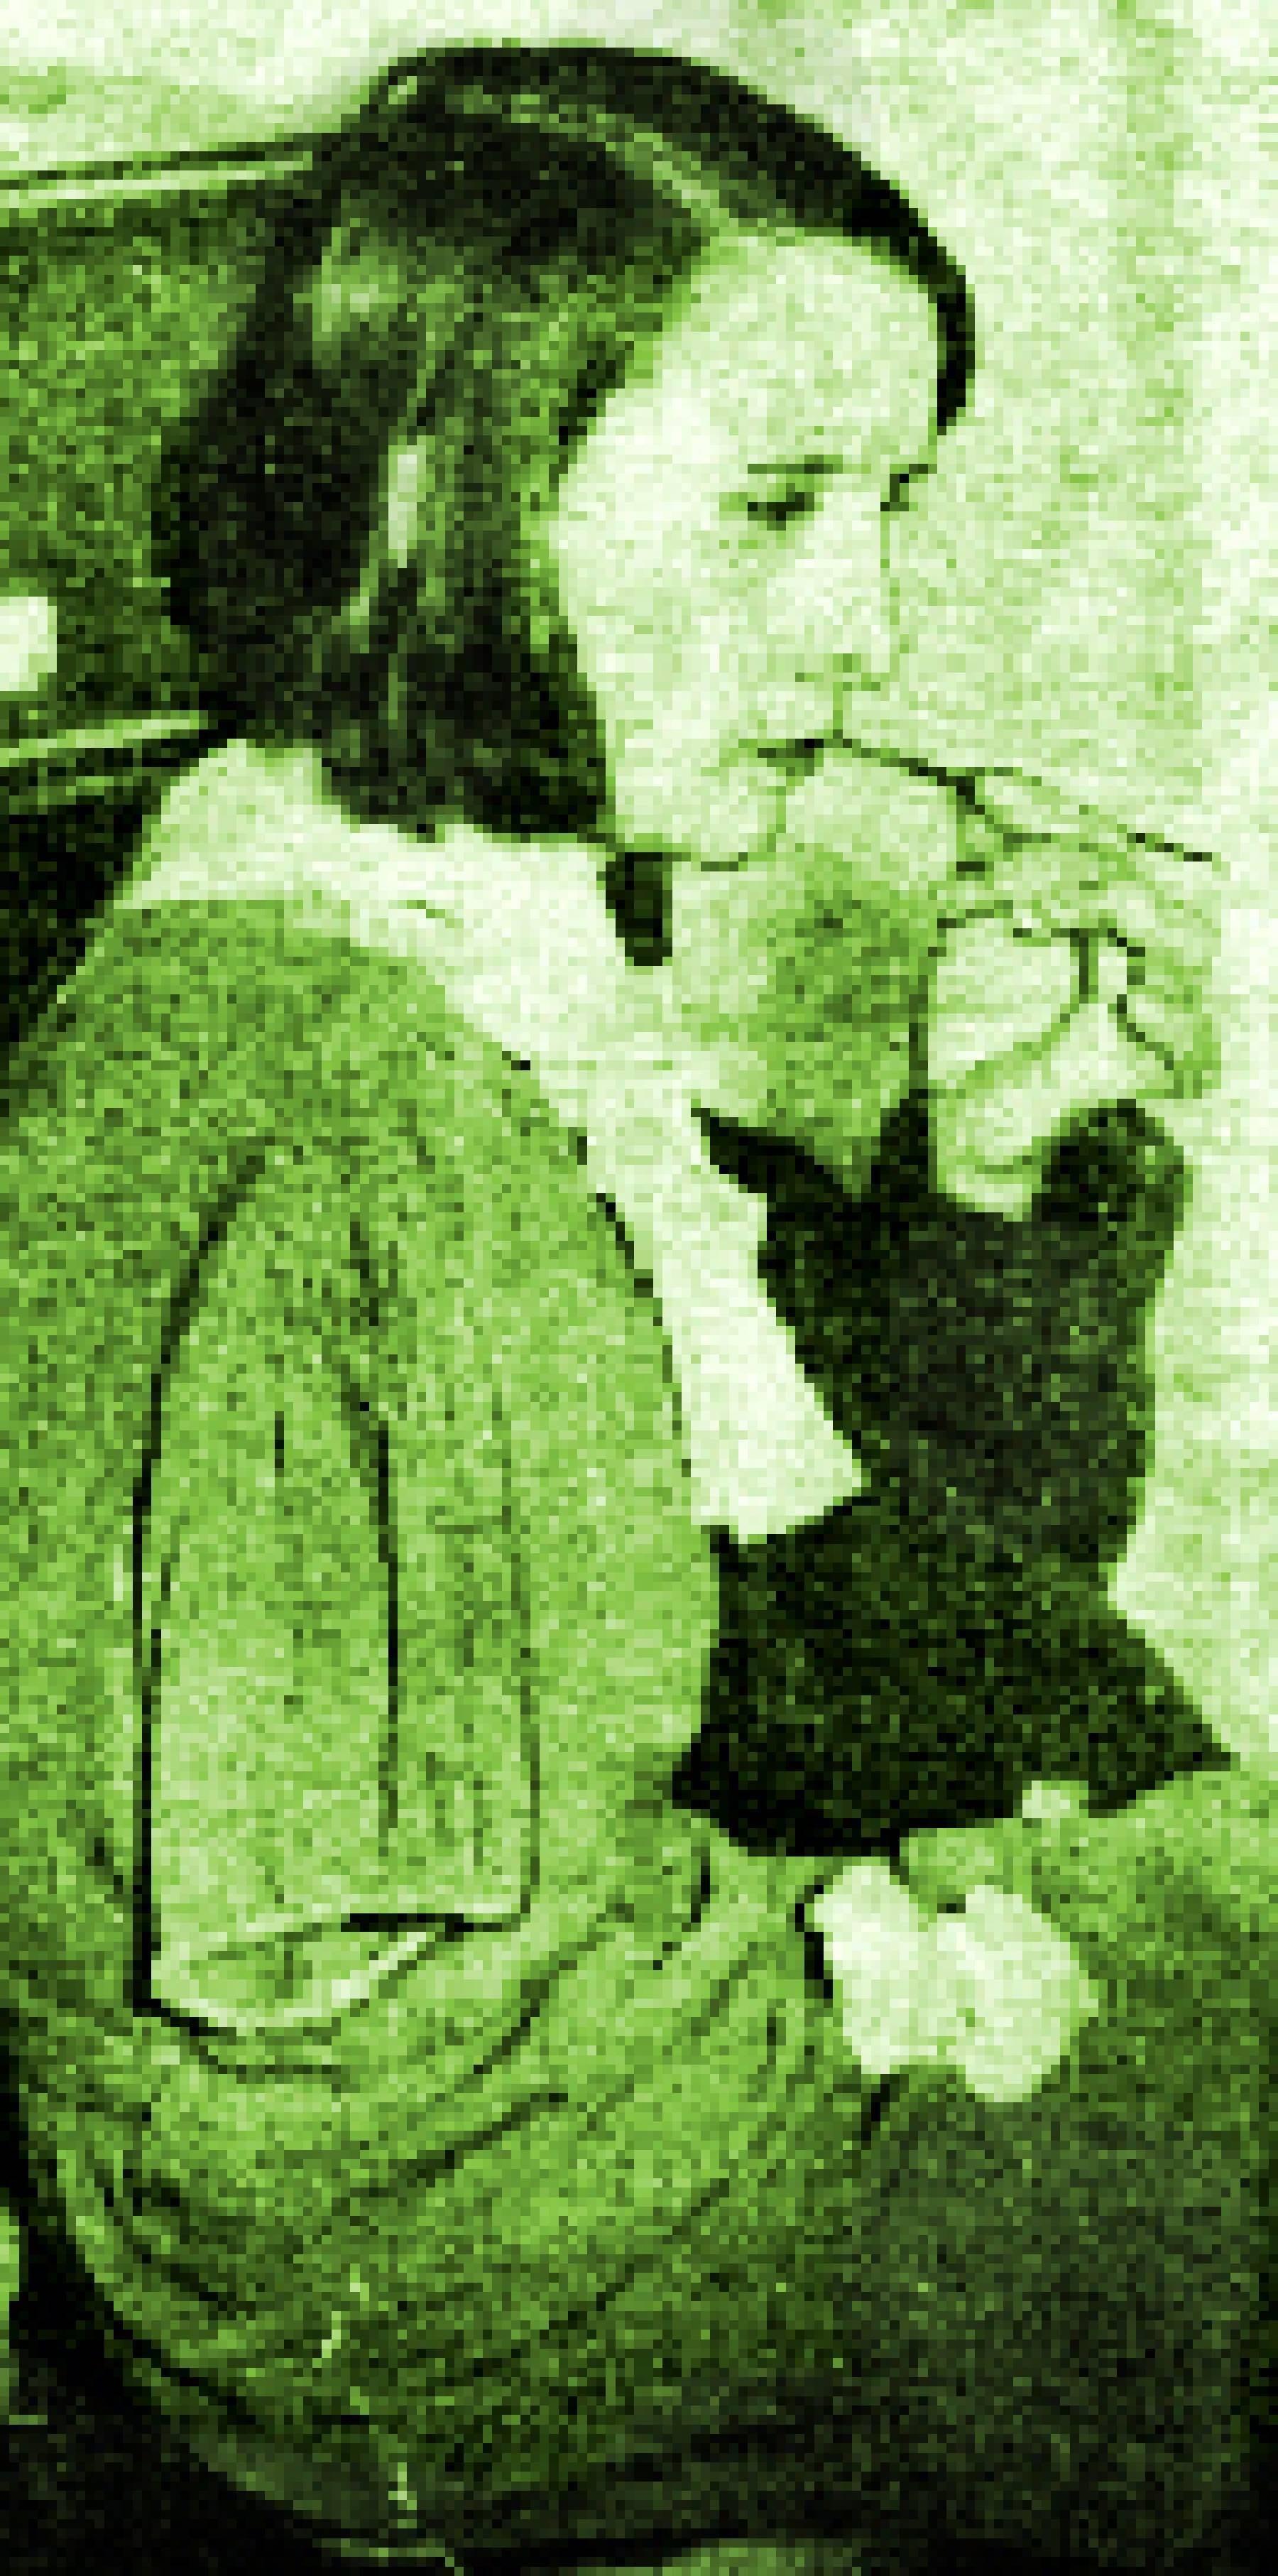 Jo Yarrington, Ghost Girls Window Transparencies, 2018, Plastic, Digital Print